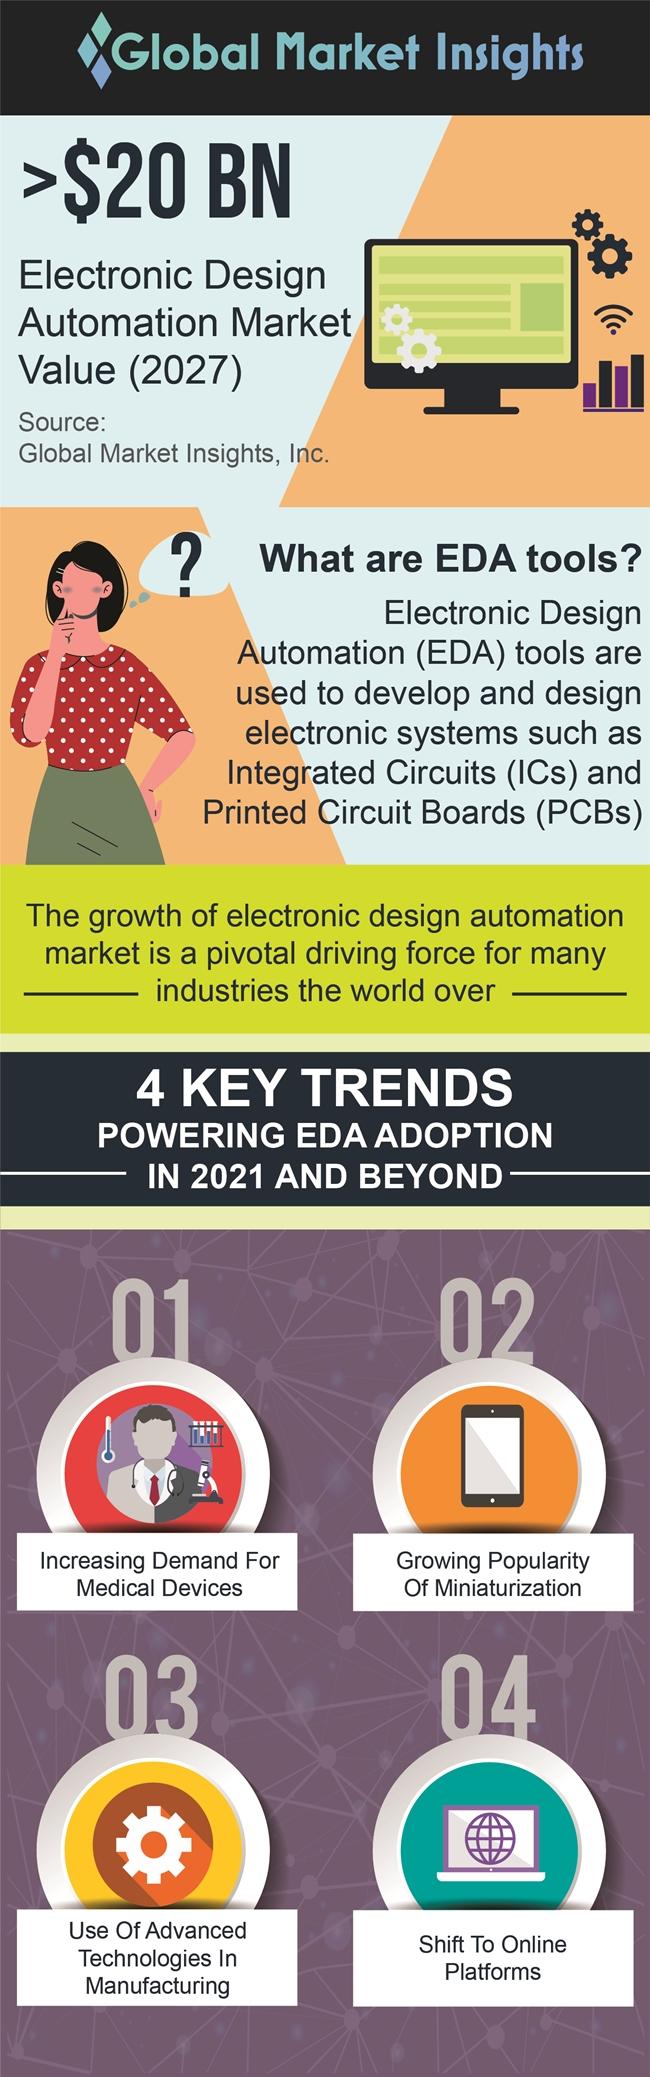 Electronic design automation market